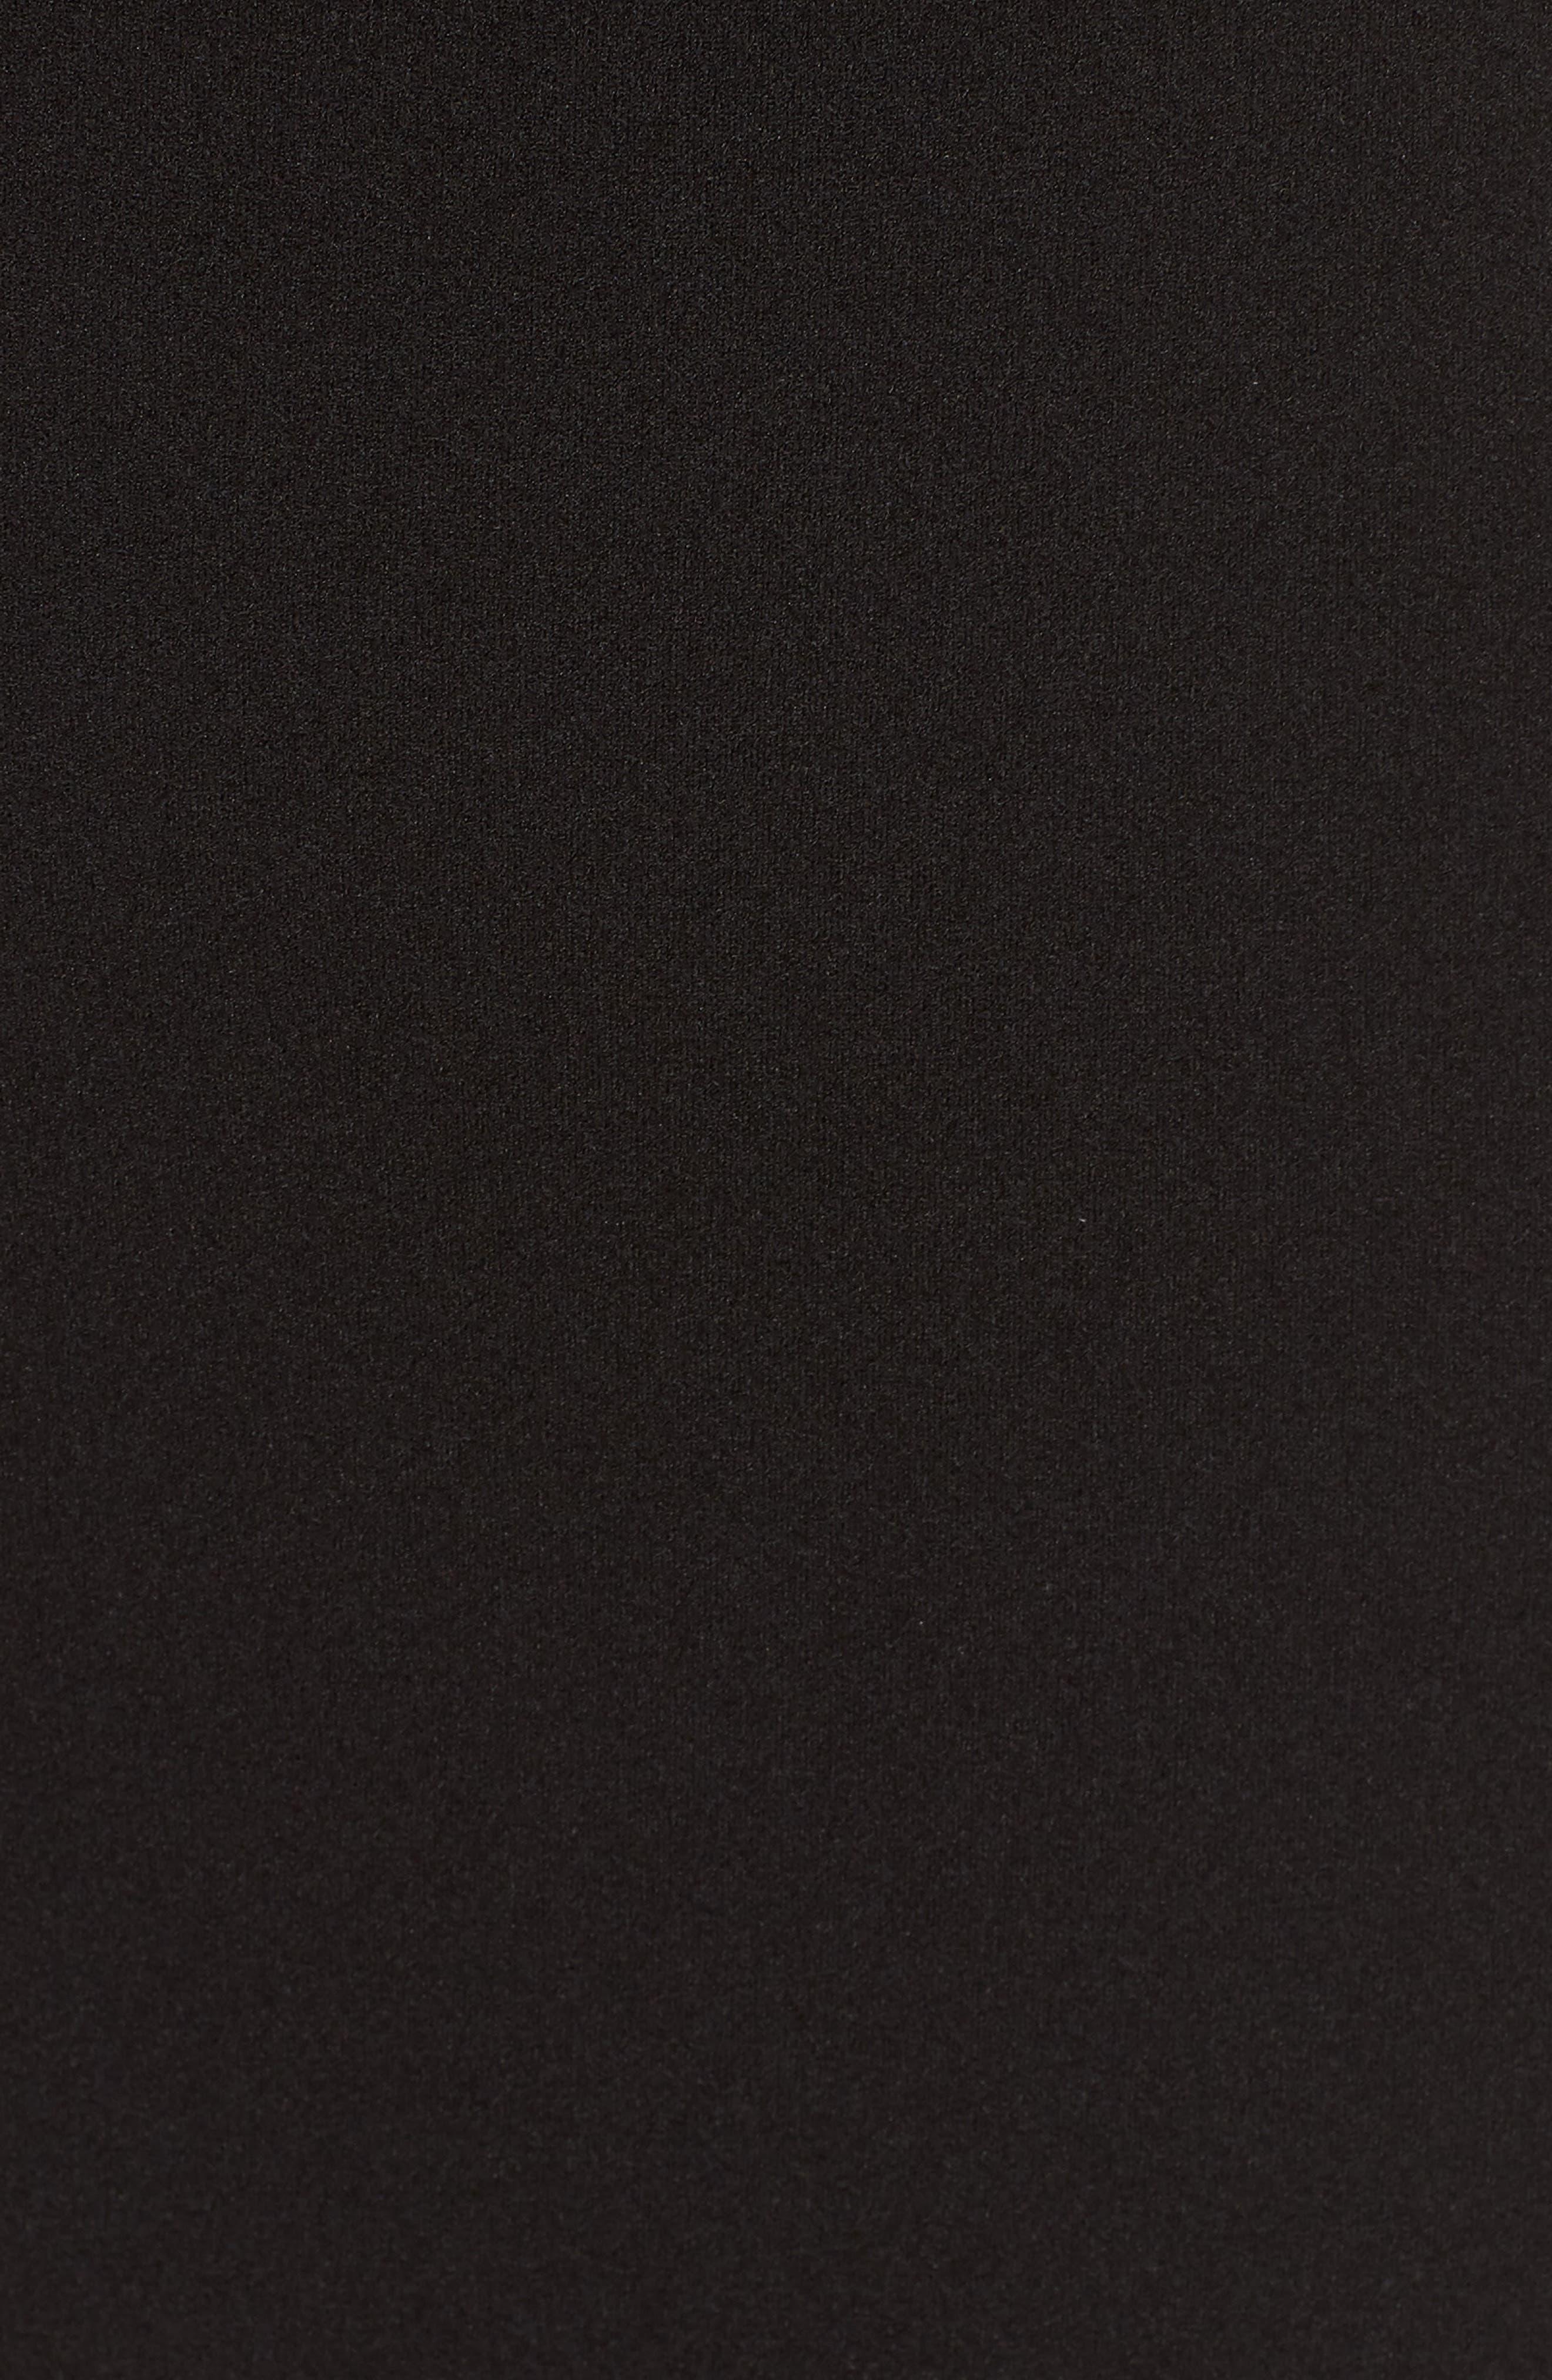 Side Cutout Body-Con Dress,                             Alternate thumbnail 5, color,                             Black